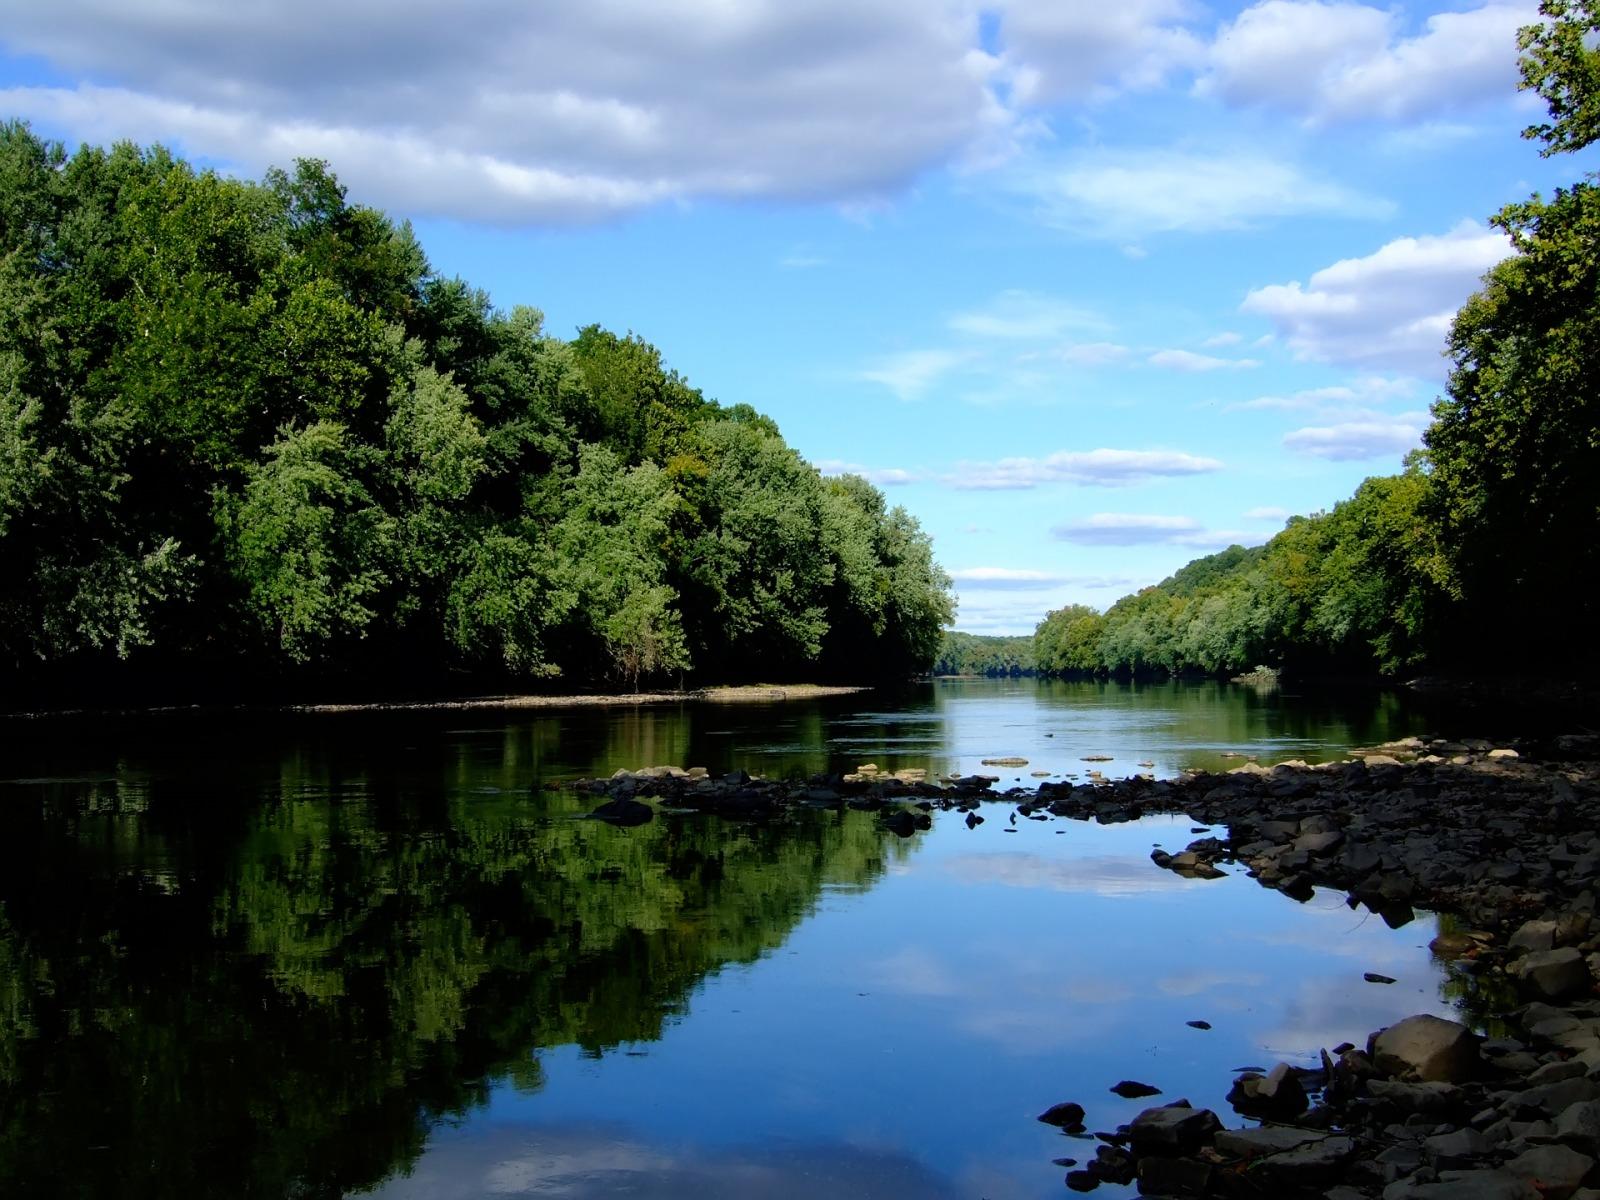 BEAUTIFUL RIVERS HD WALLPAPERS   Top HD Wallpapers